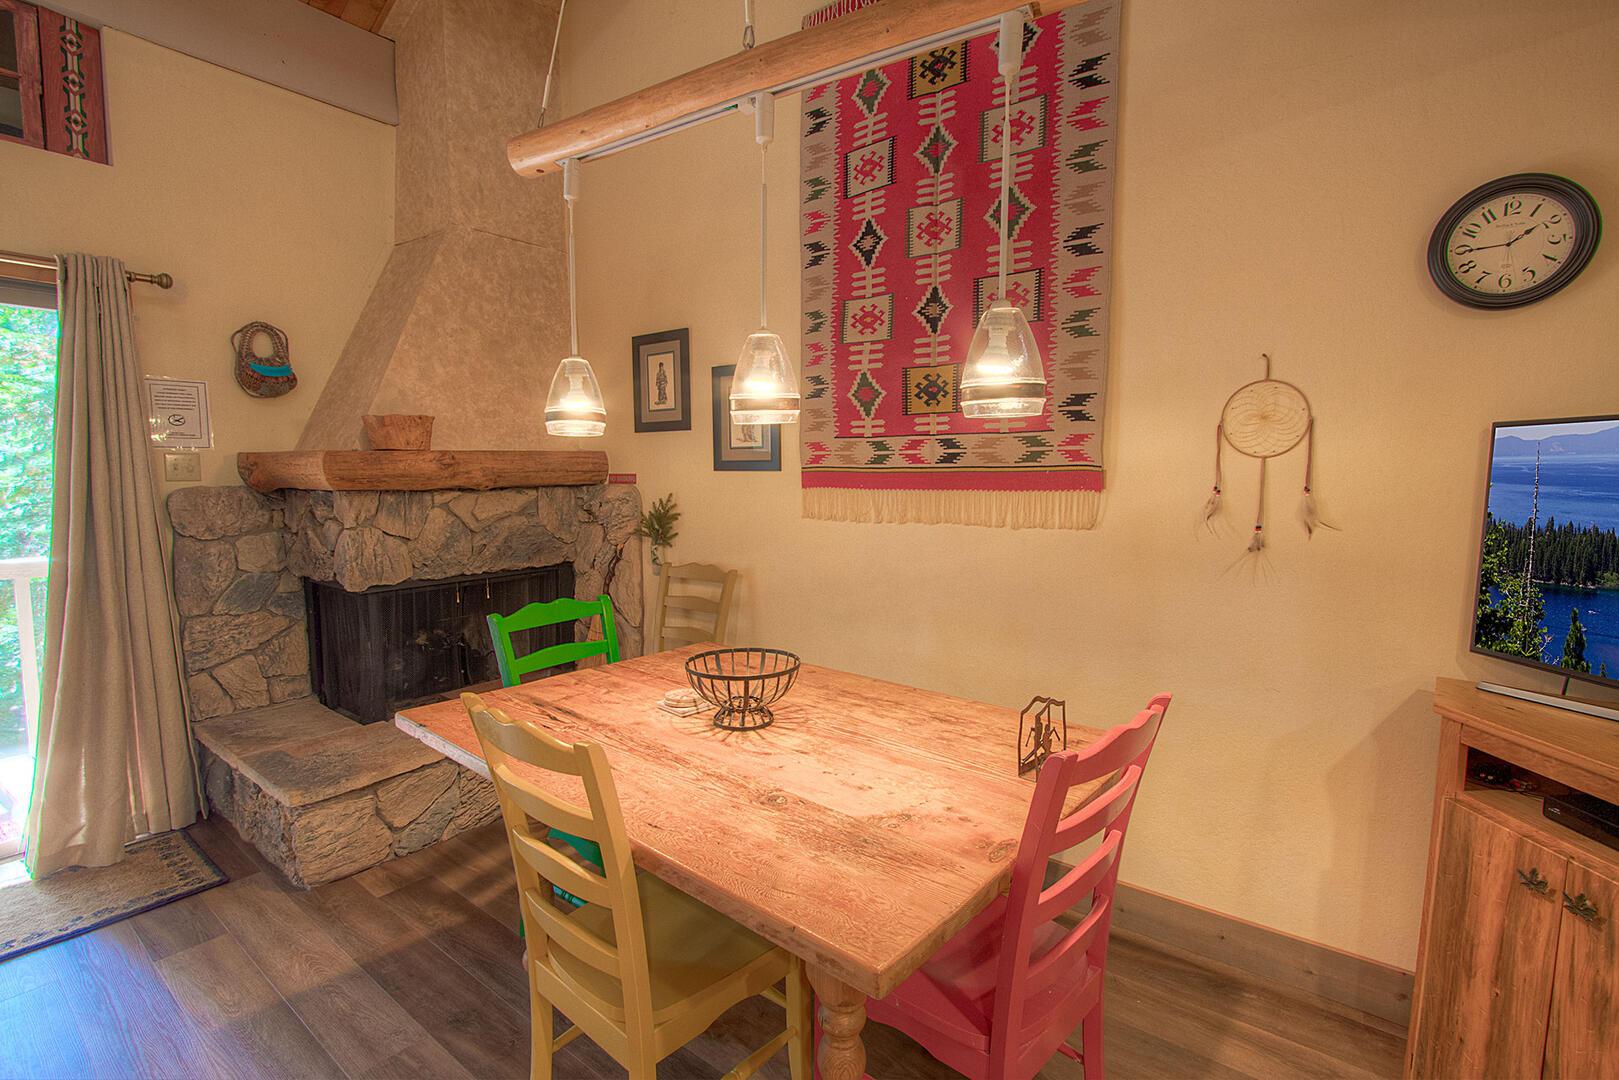 kwc0854 Dining Room